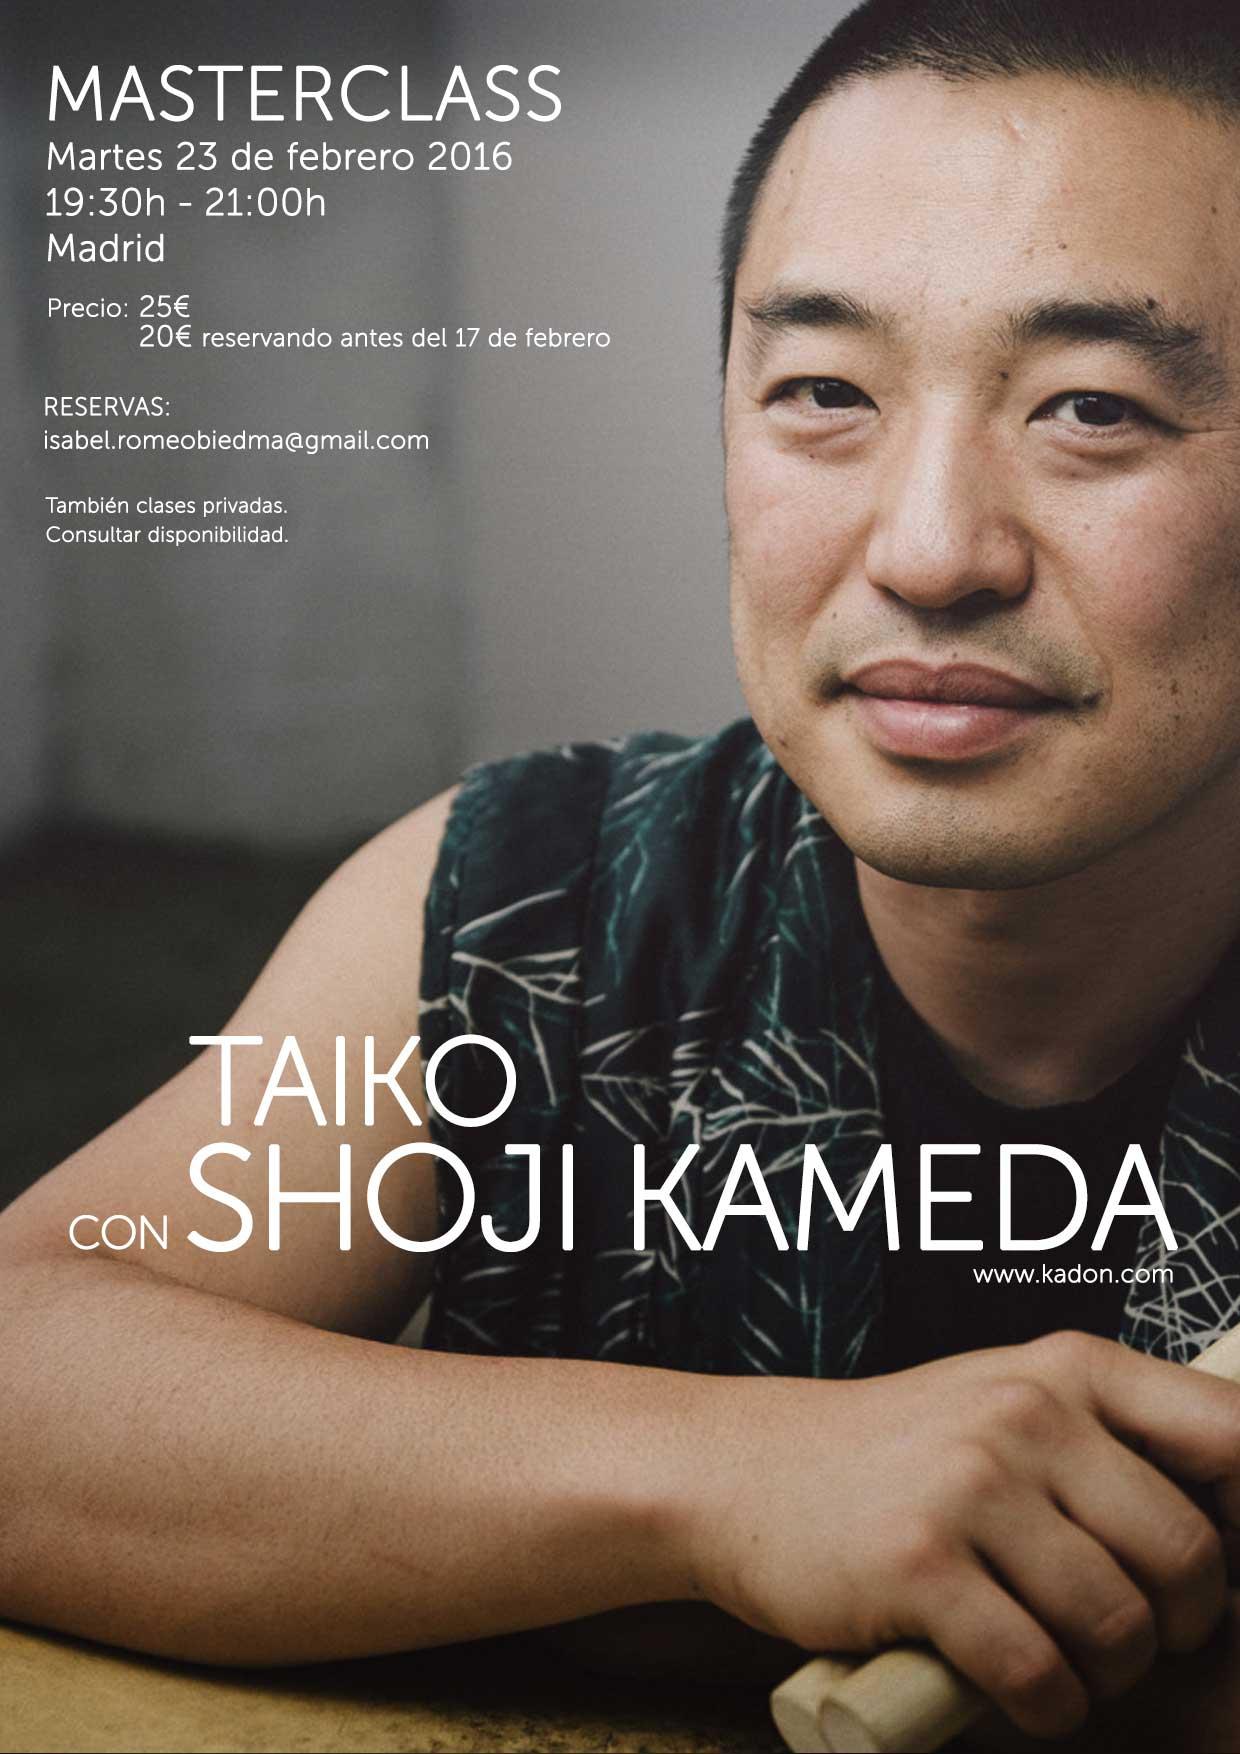 Shoji_Kameda_VERTICAL_impresion